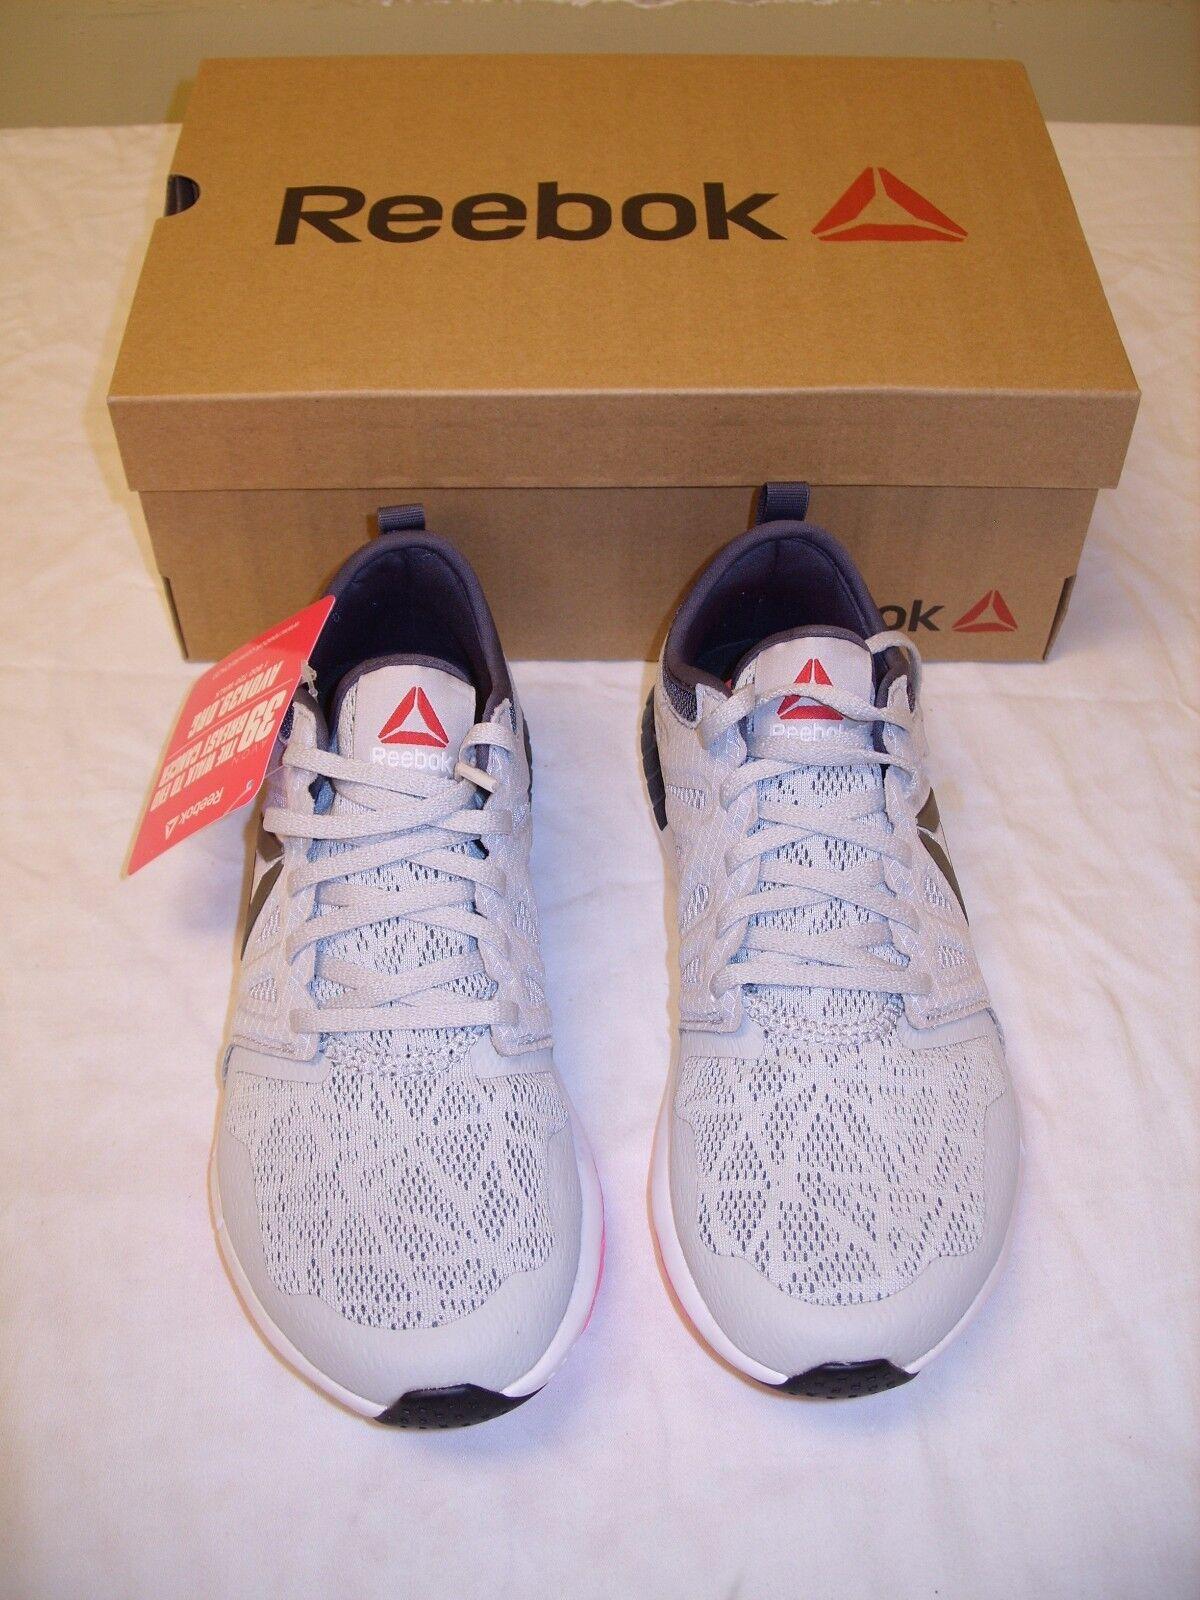 REEBOK ZPrint 3D Avon Womens Athletic Running shoes BD2919  Grey Pink NEW